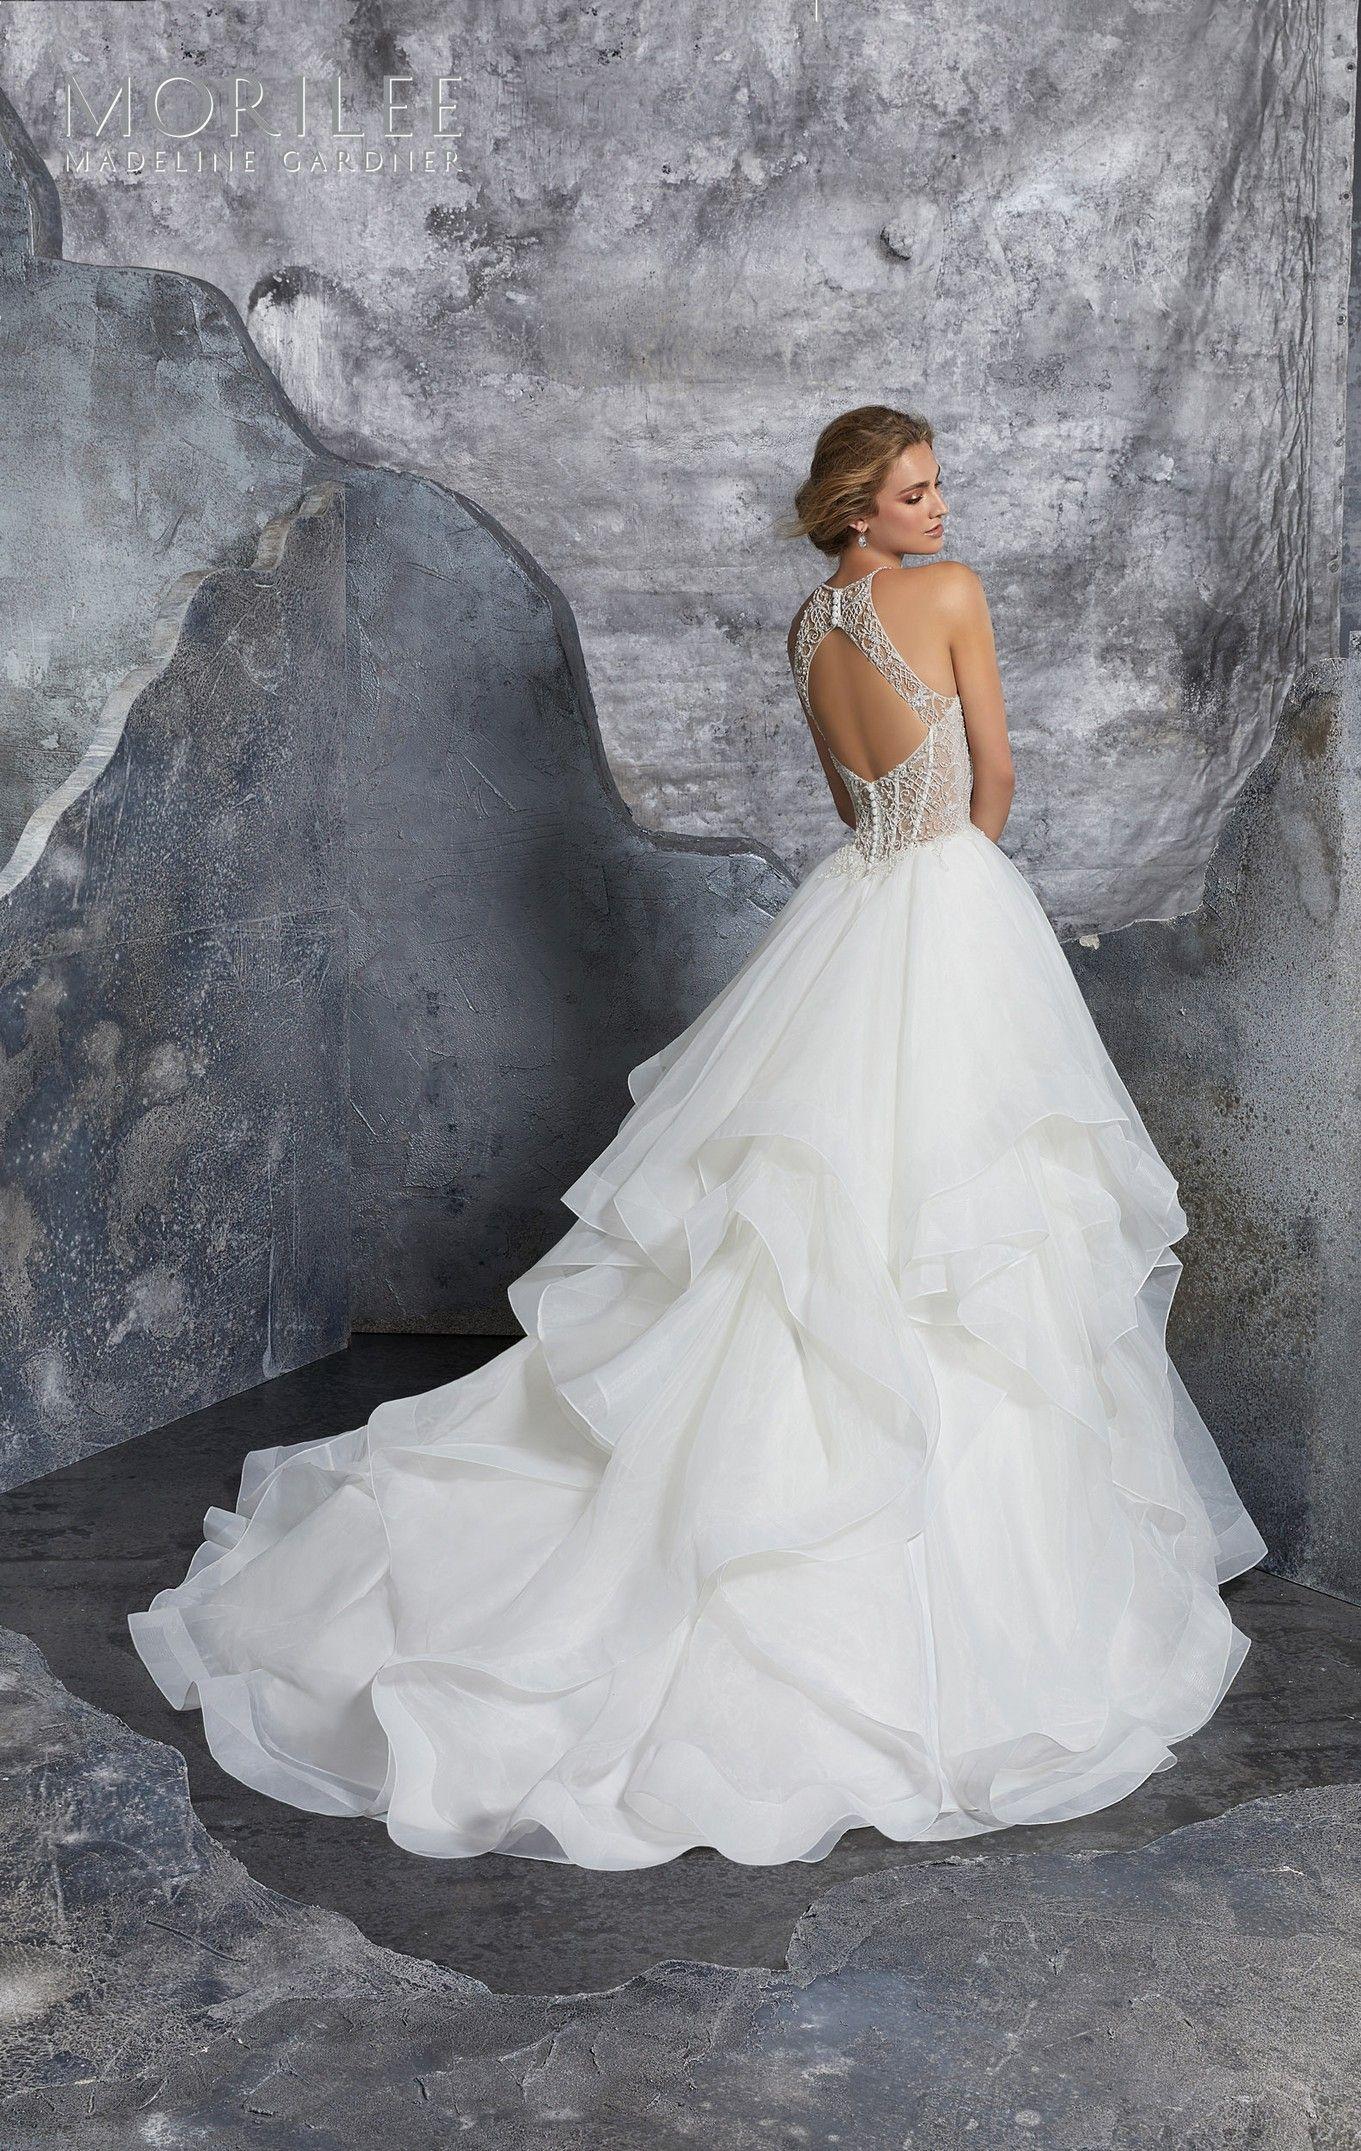 Kali wedding dress d pinterest wedding dress and weddings